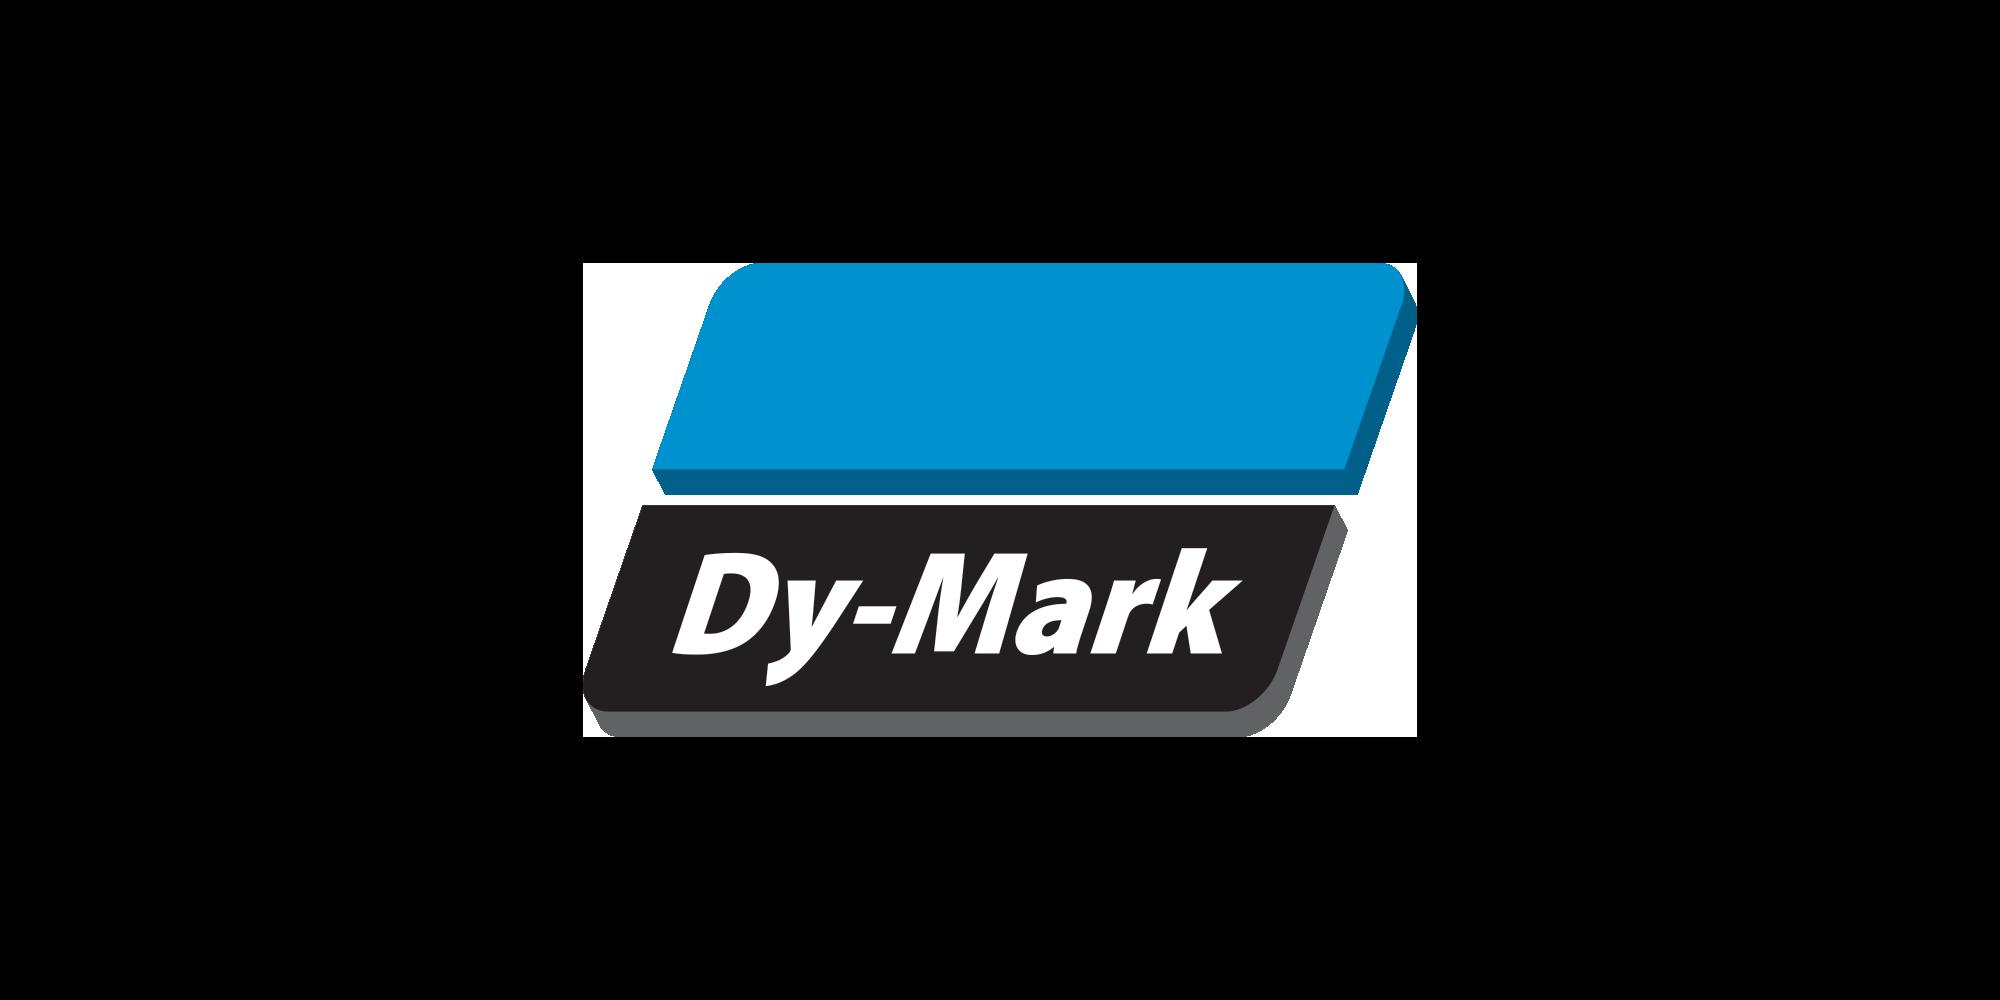 Dy-Mark